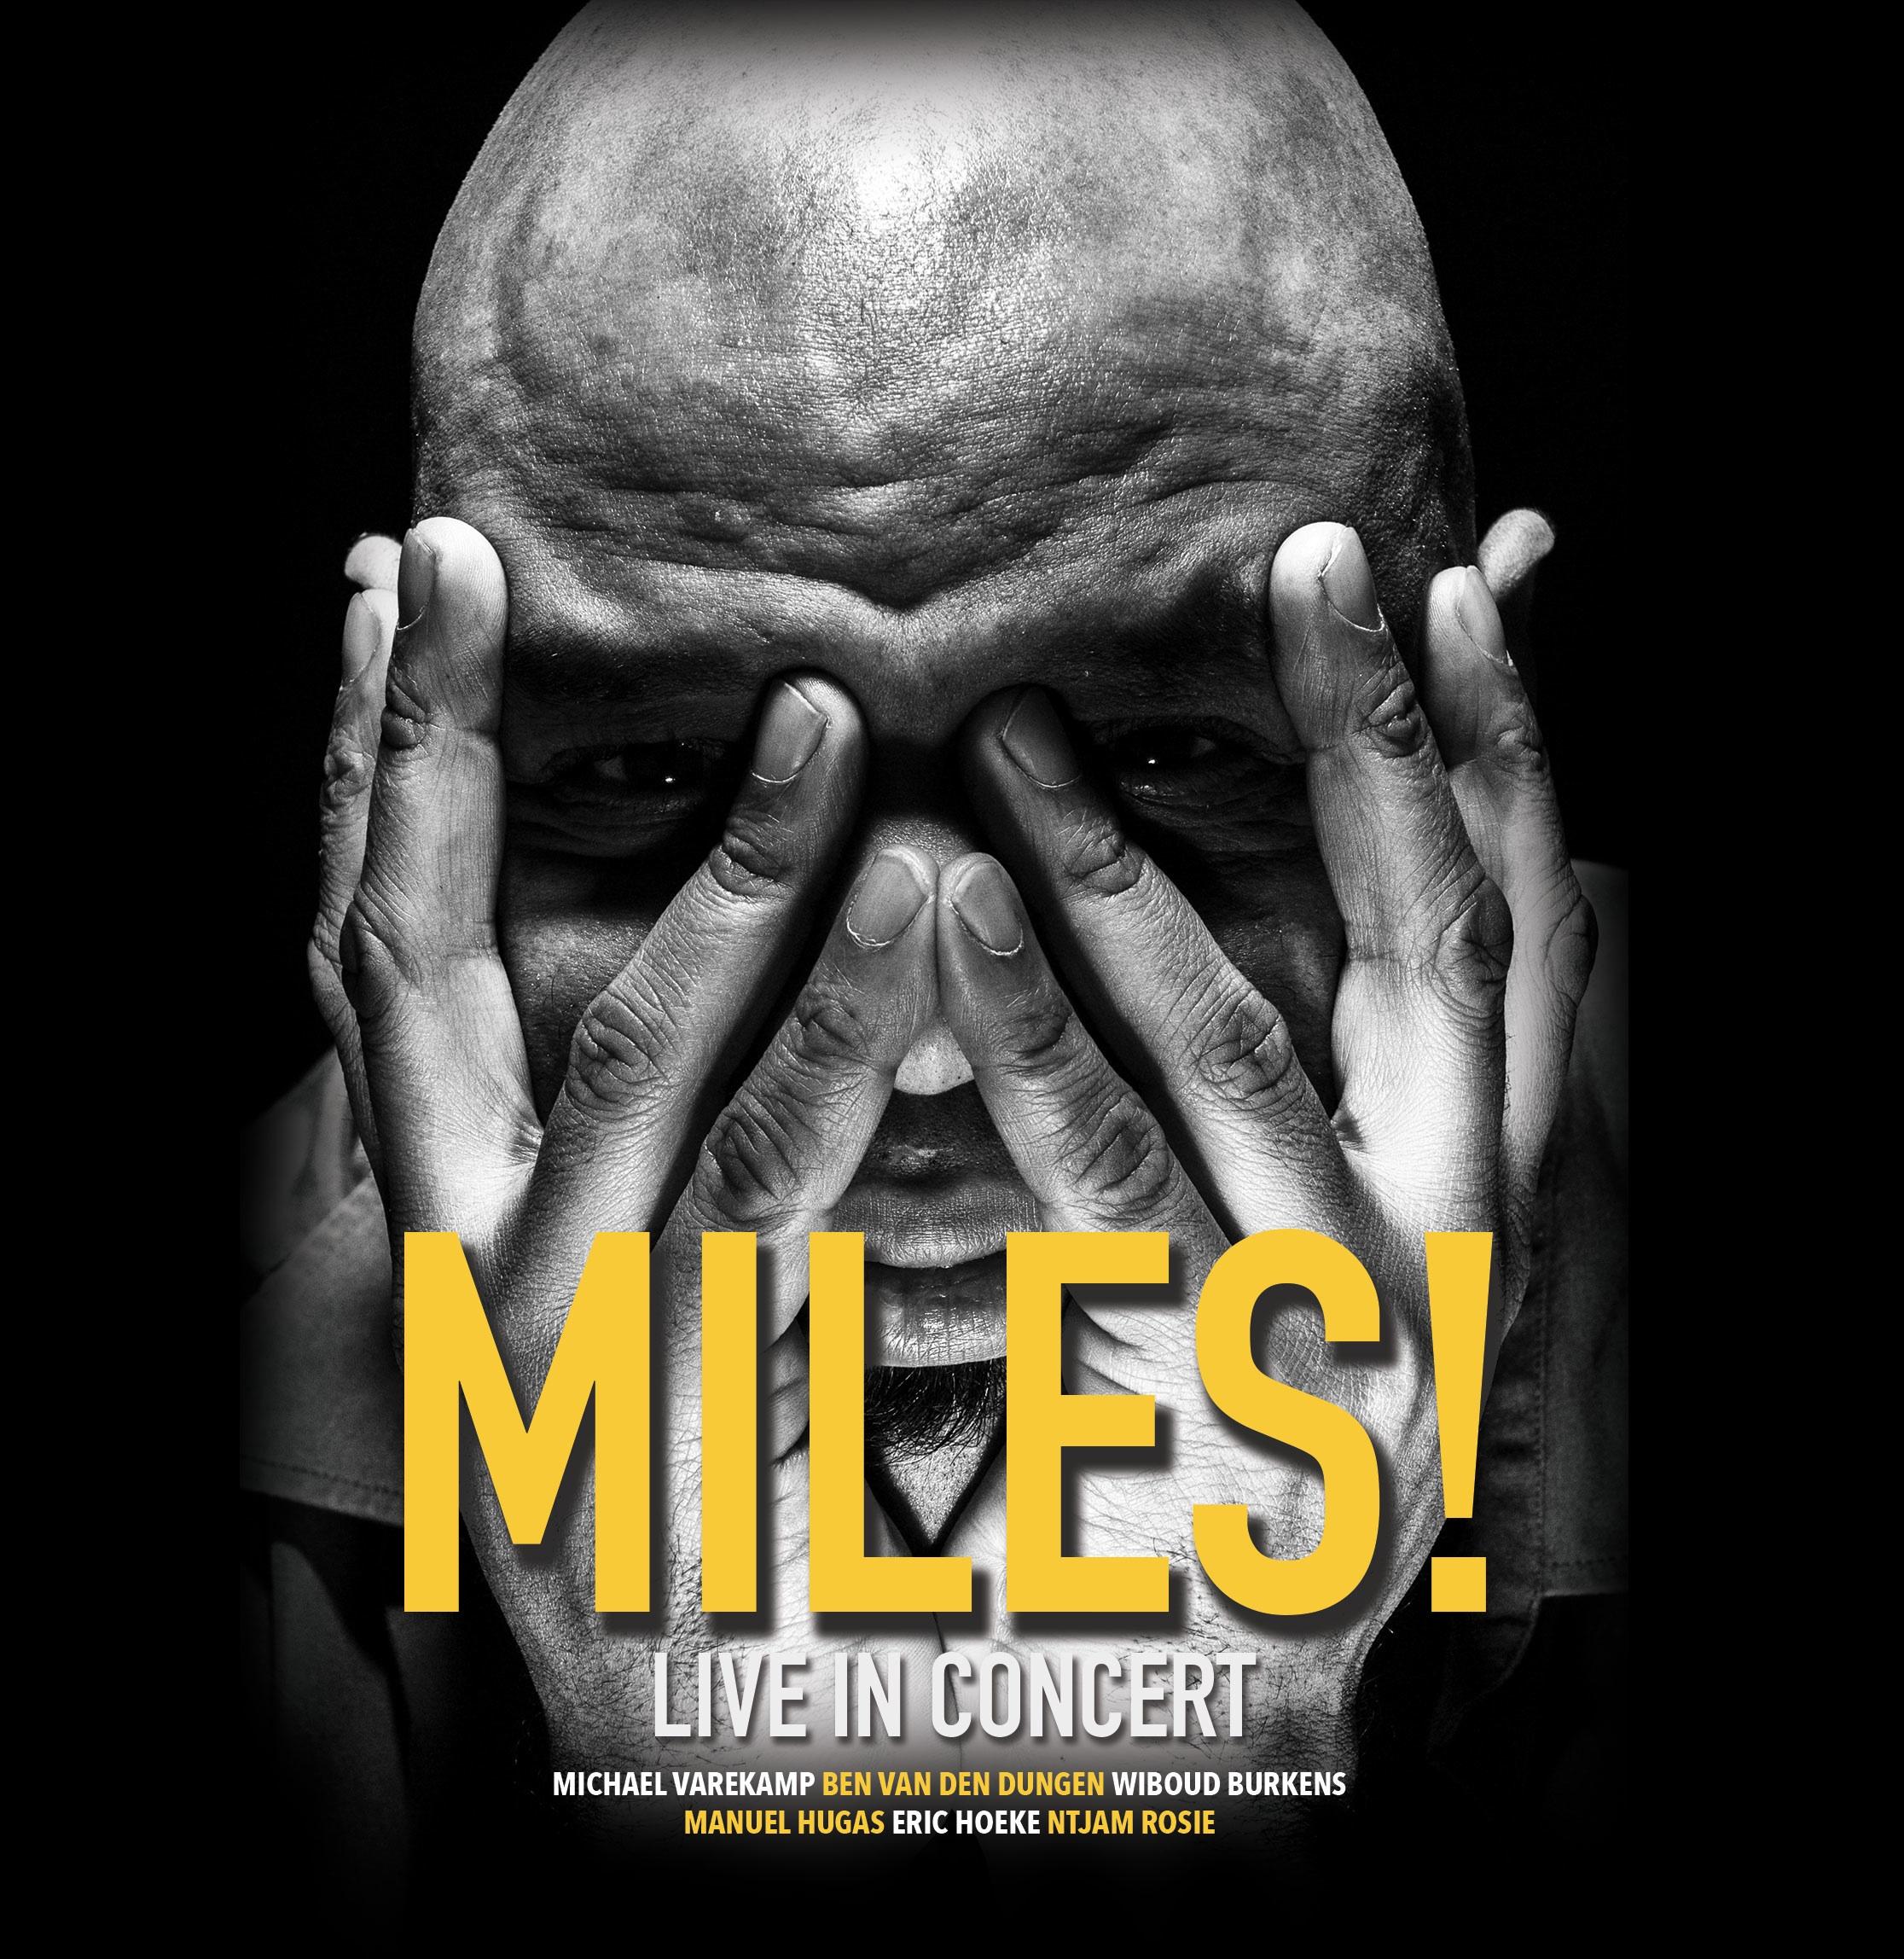 MILES! CD / LP / DVD